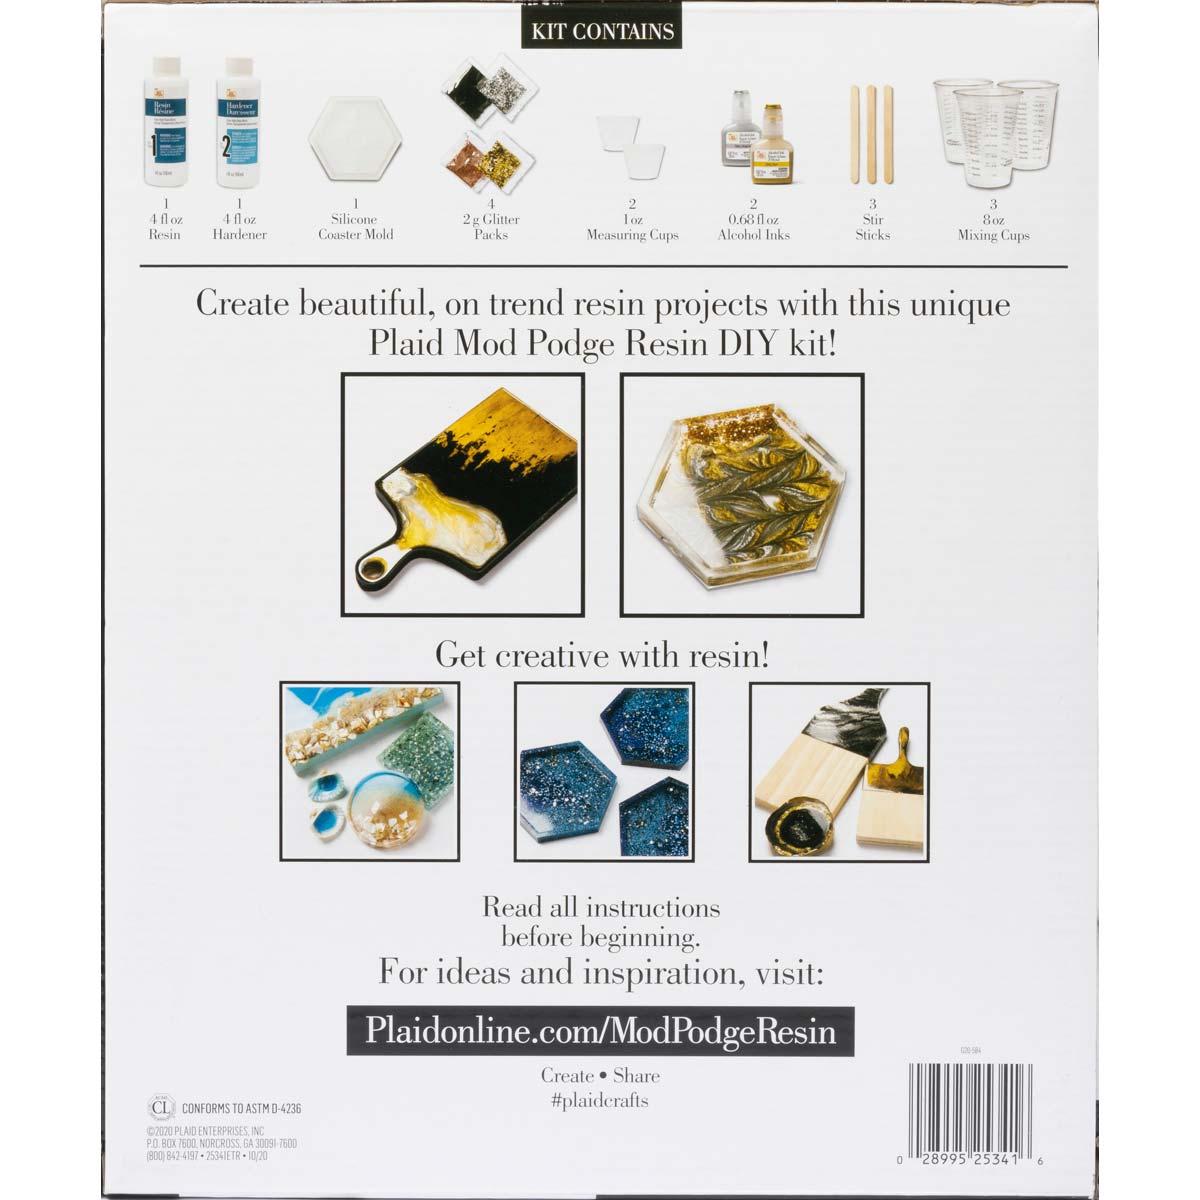 Mod Podge ® Do-It-Yourself Resin Kit - Cutting Board - 25341E